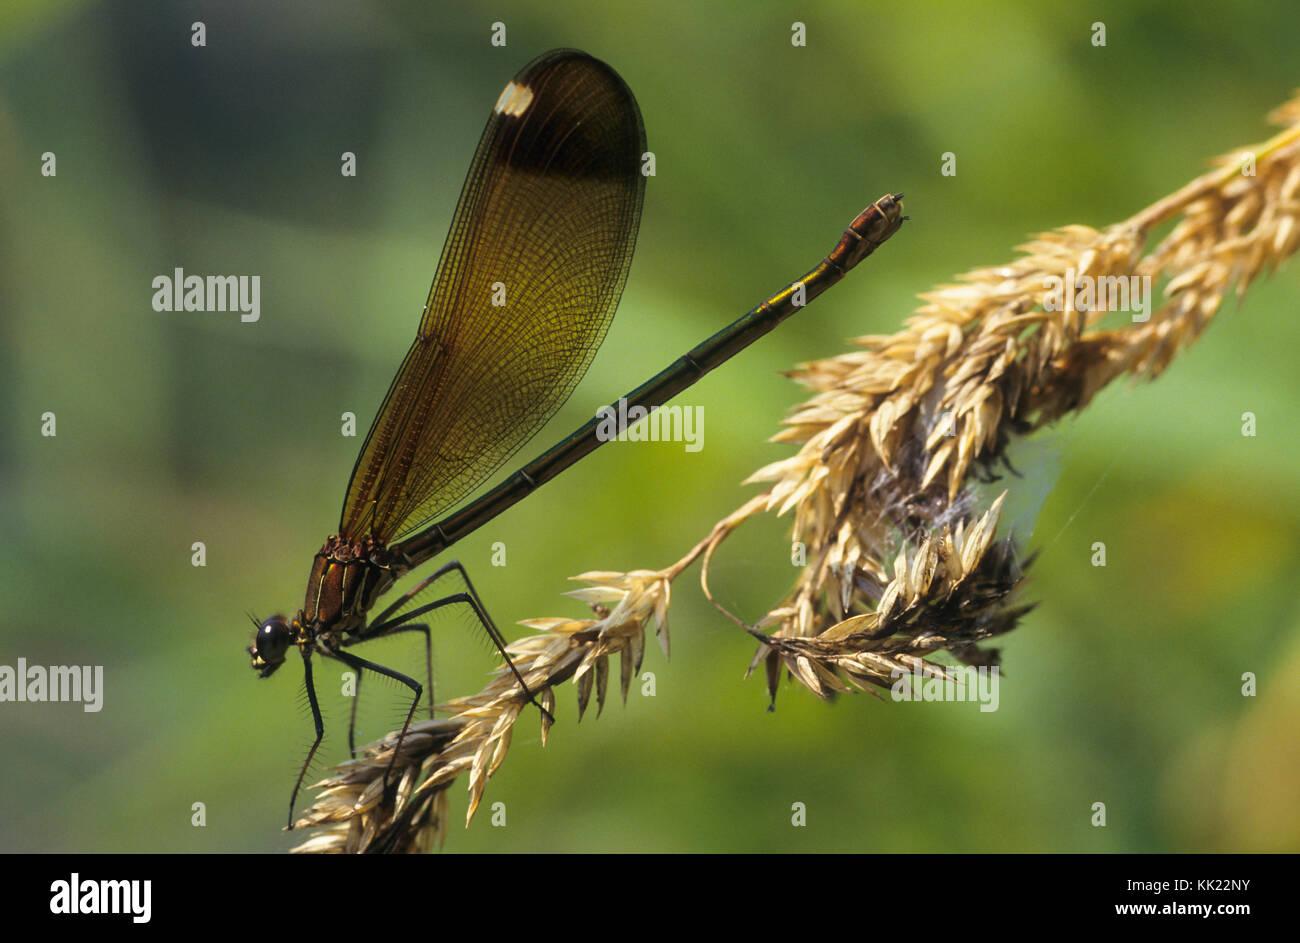 Bronzene Prachtlibelle, Braune Prachtlibelle, Rote Prachtlibelle, Weibchen, Calopteryx haemorrhoidalis, Calopteryx - Stock Image